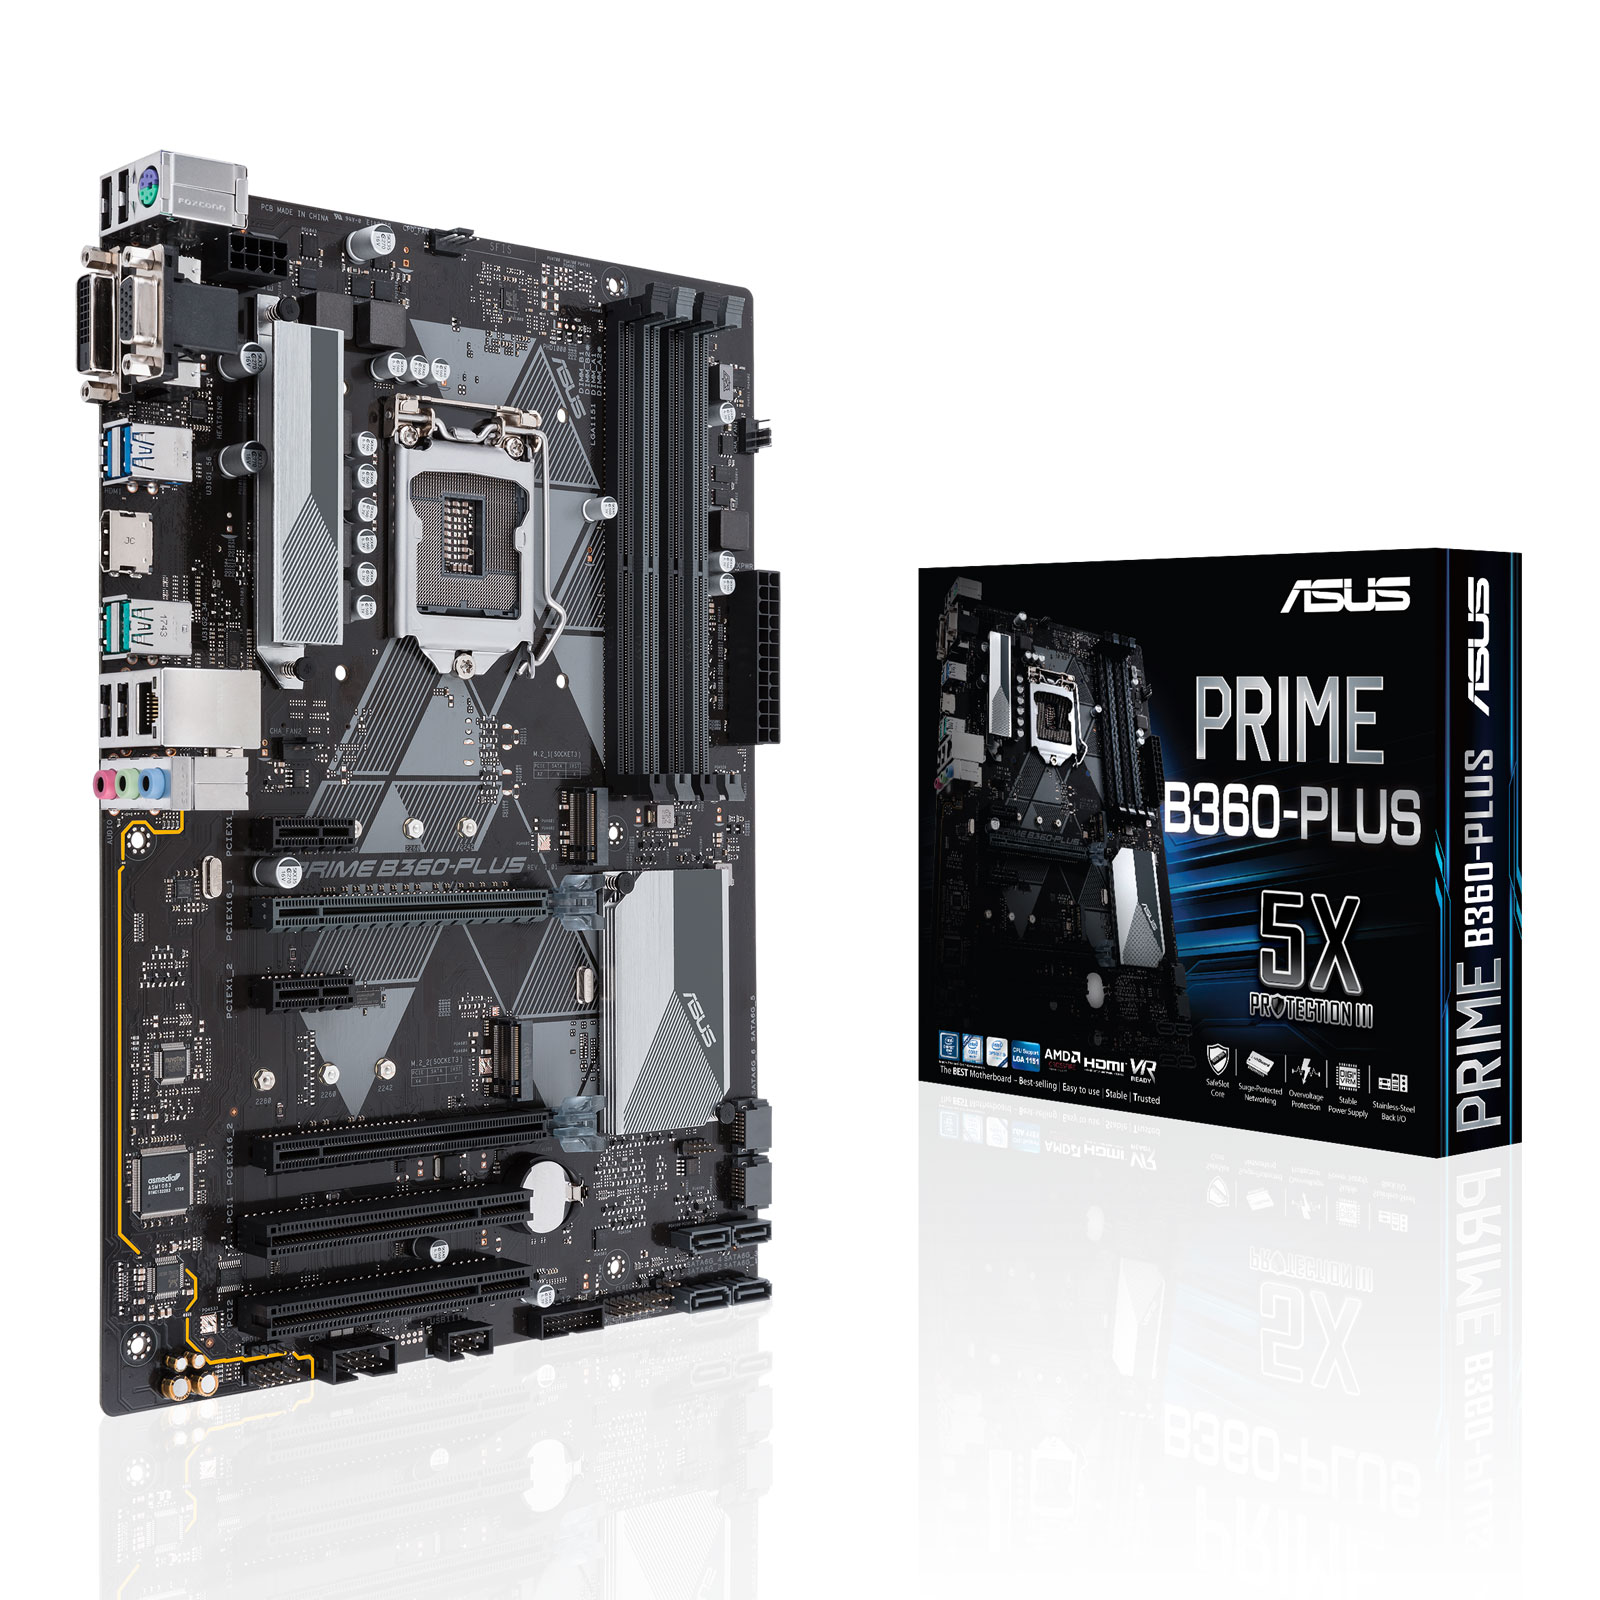 Carte mère ASUS PRIME B360-PLUS Carte mère ATX Socket 1151 Intel B360 Express - 4x DDR4 - SATA 6Gb/s + M.2 - USB 3.1 - 2x PCI-Express 3.0 16x